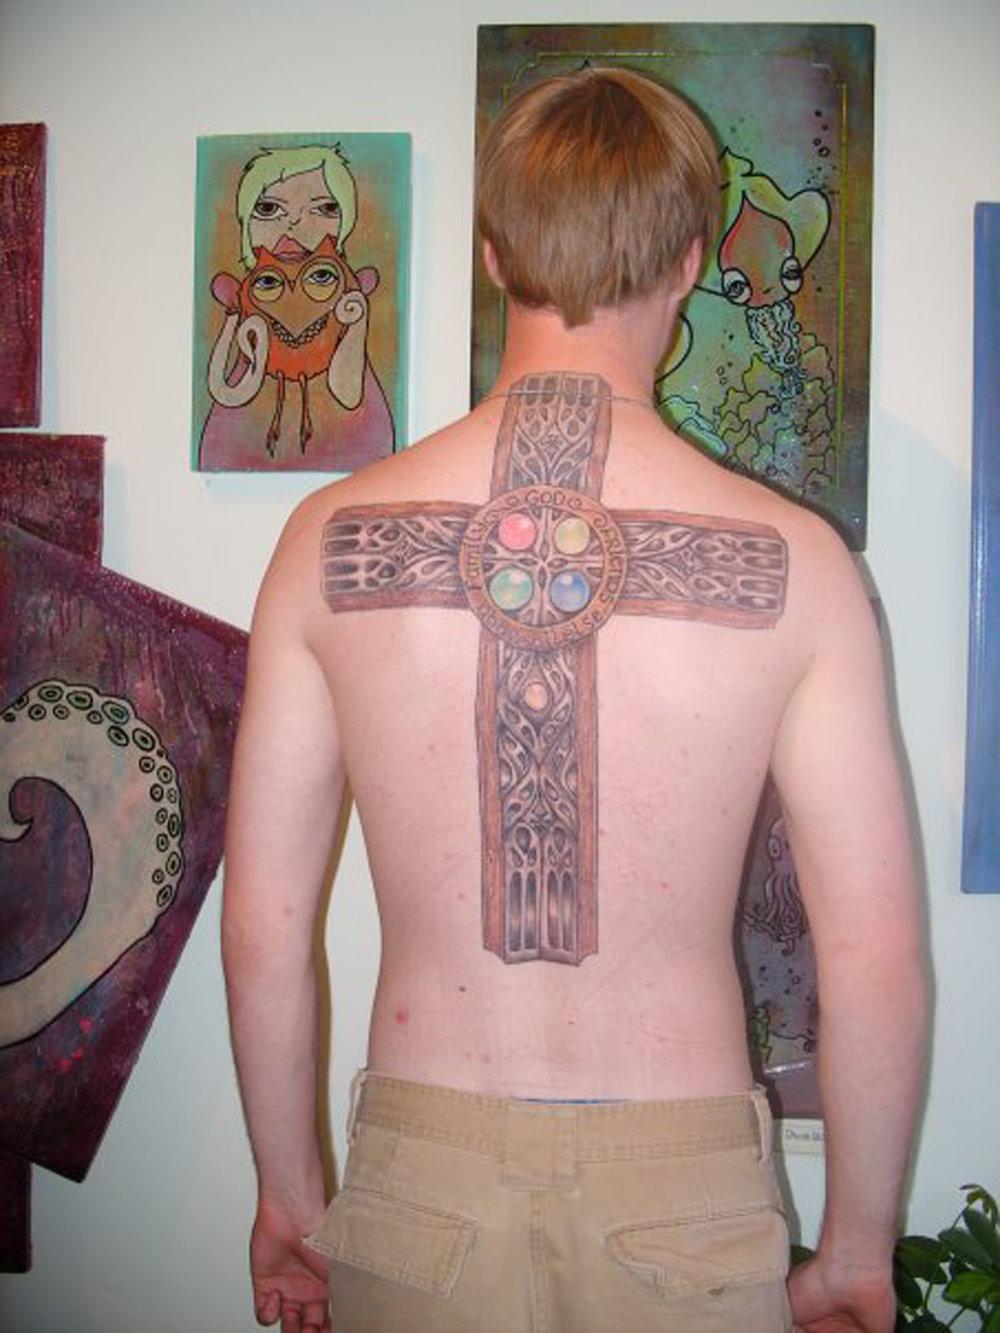 david's cross 2005